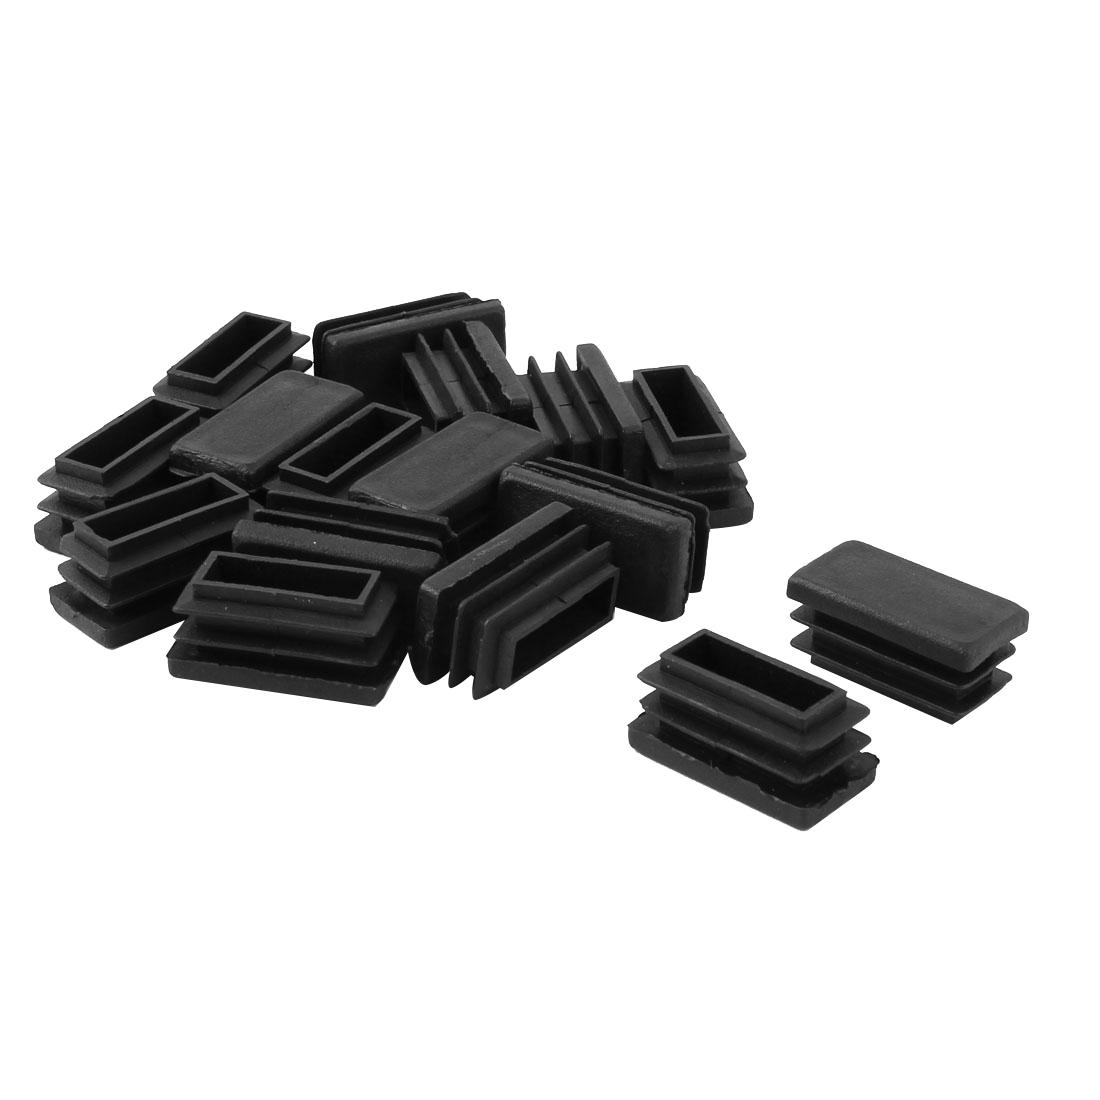 Desk Chair Feet Plastic Rectangle Tube Inserts End Blanking Caps Black 16pcs